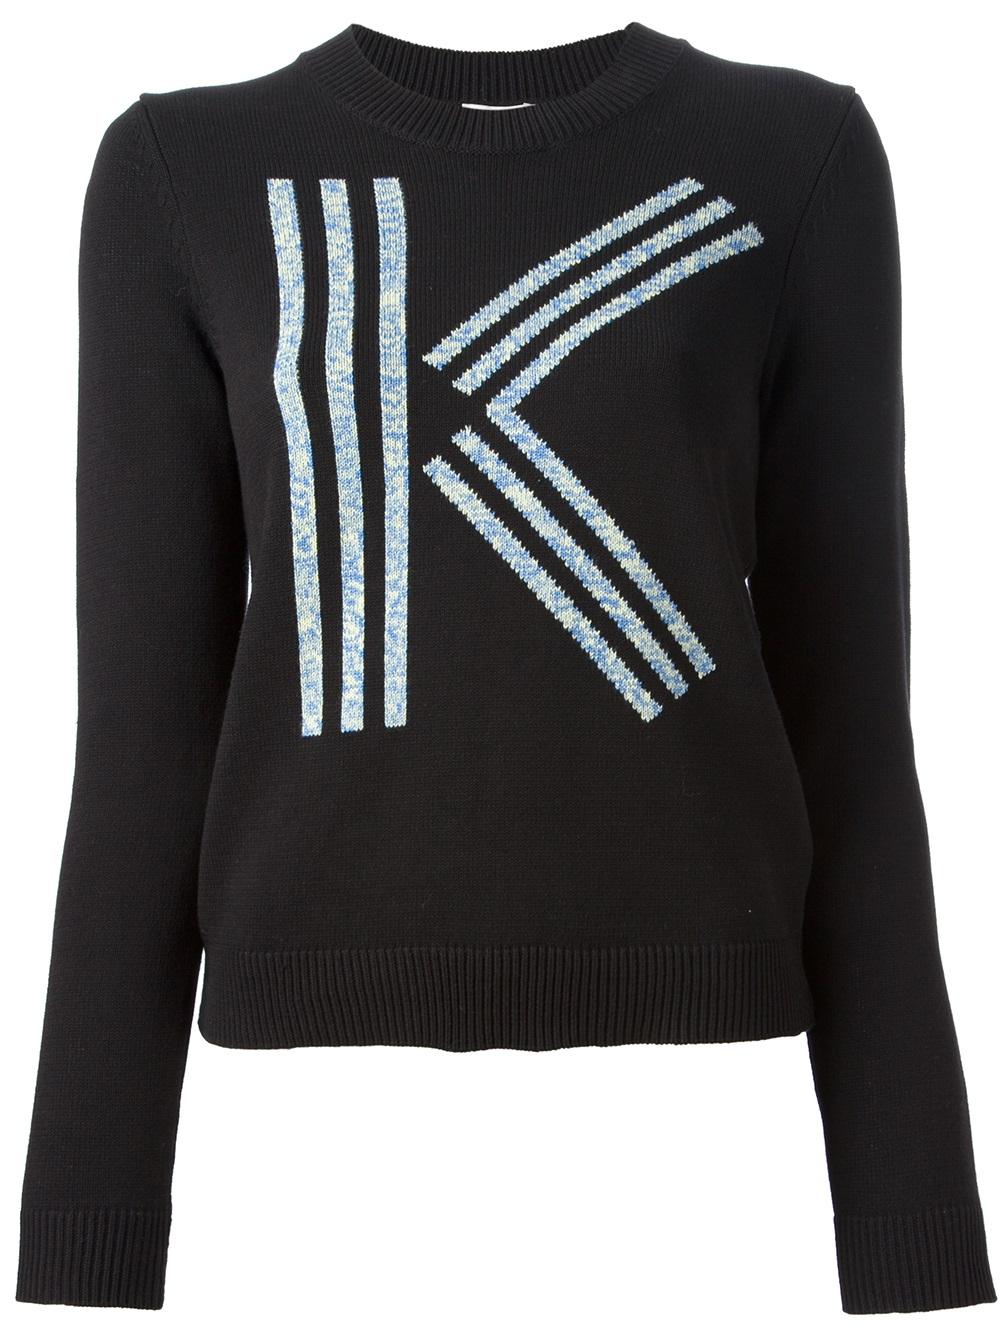 kenzo logo sweater in black lyst. Black Bedroom Furniture Sets. Home Design Ideas